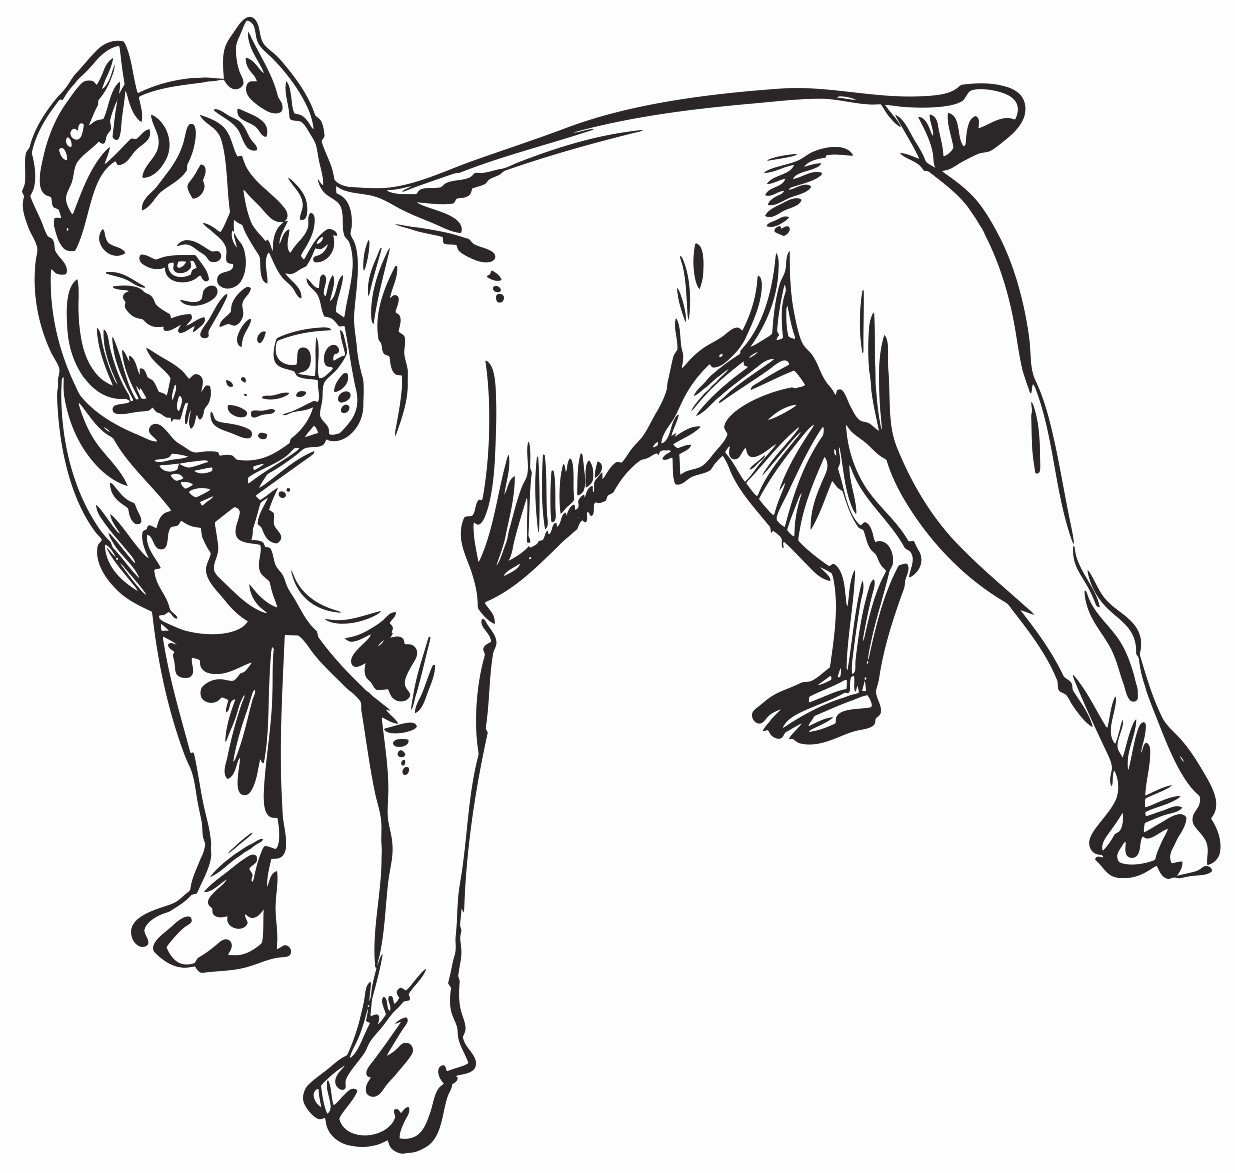 1235x1173 Hand Drawing Pitbull Demon Dog Imp Printable Image Illustration